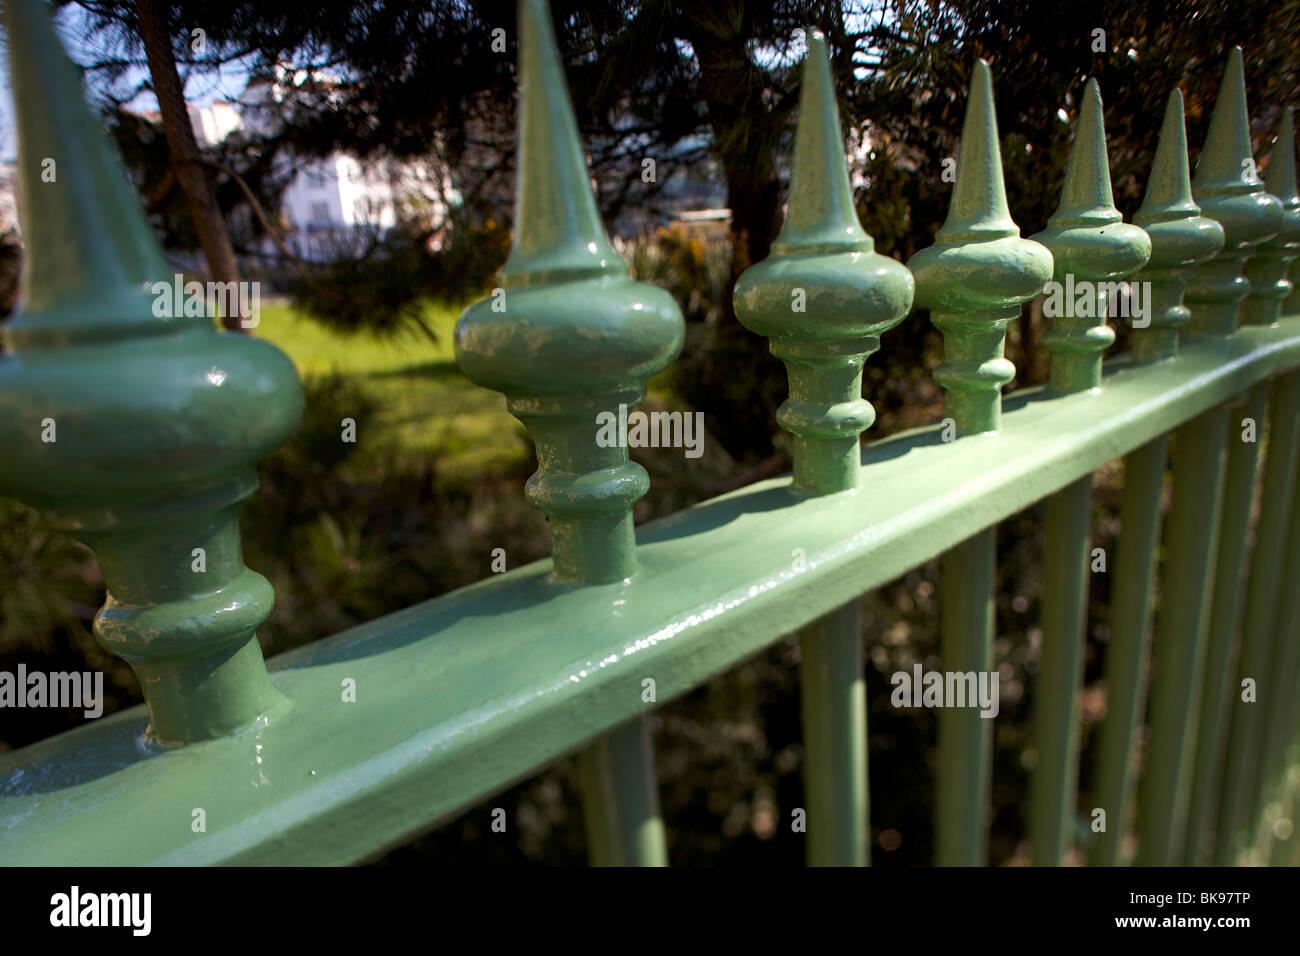 Green cast iron railings - Stock Image